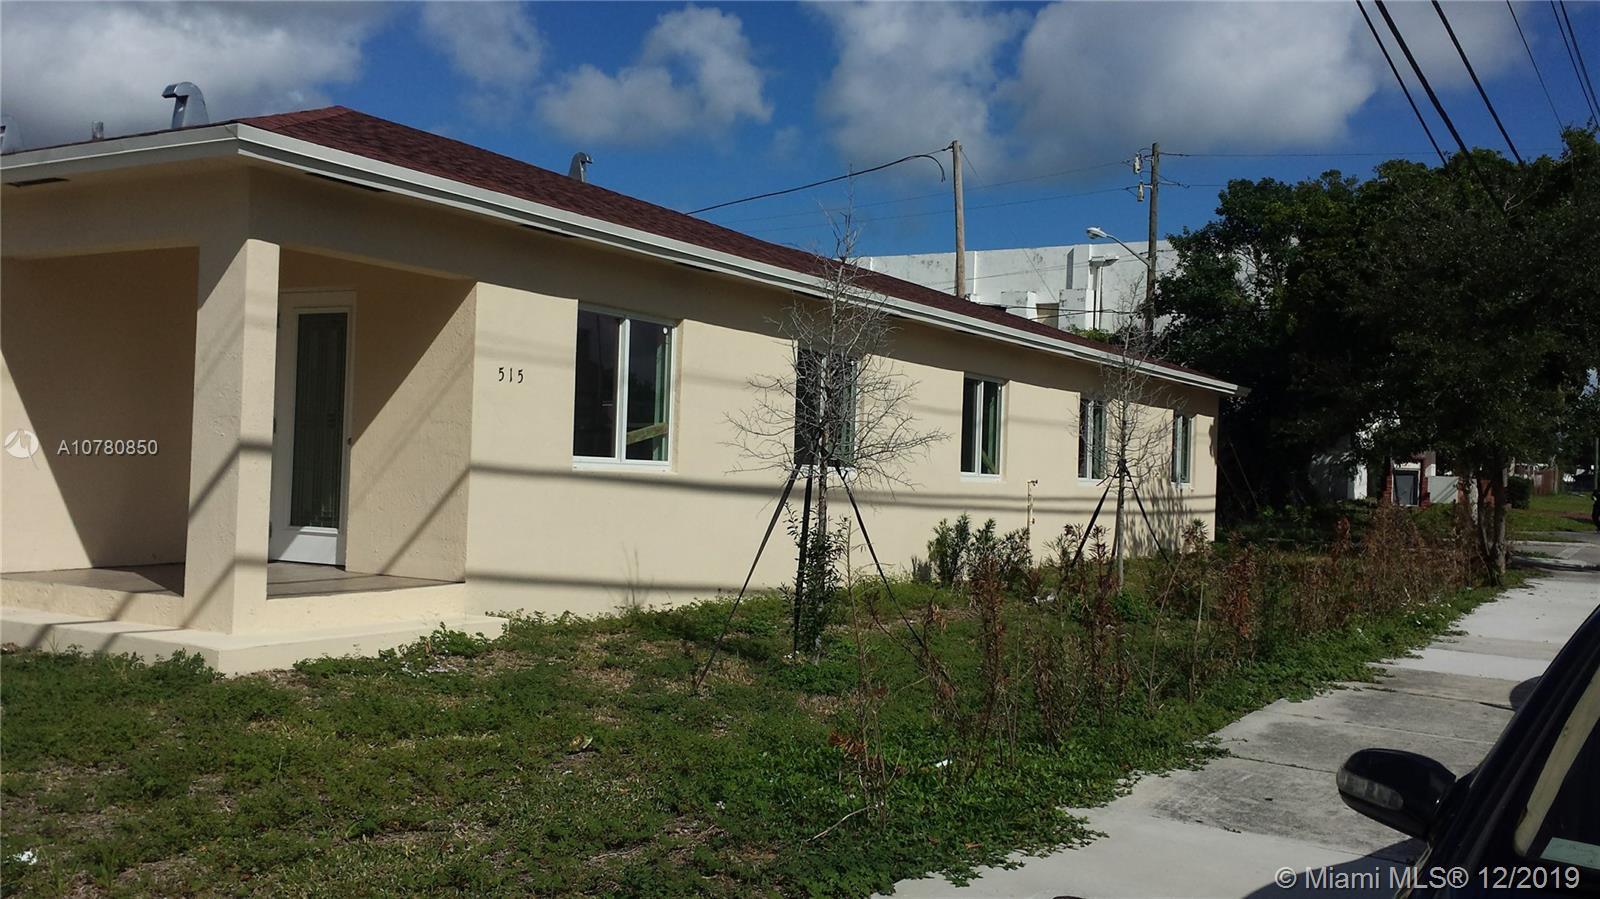 515-513 NW 77th St, Miami Shores, Florida